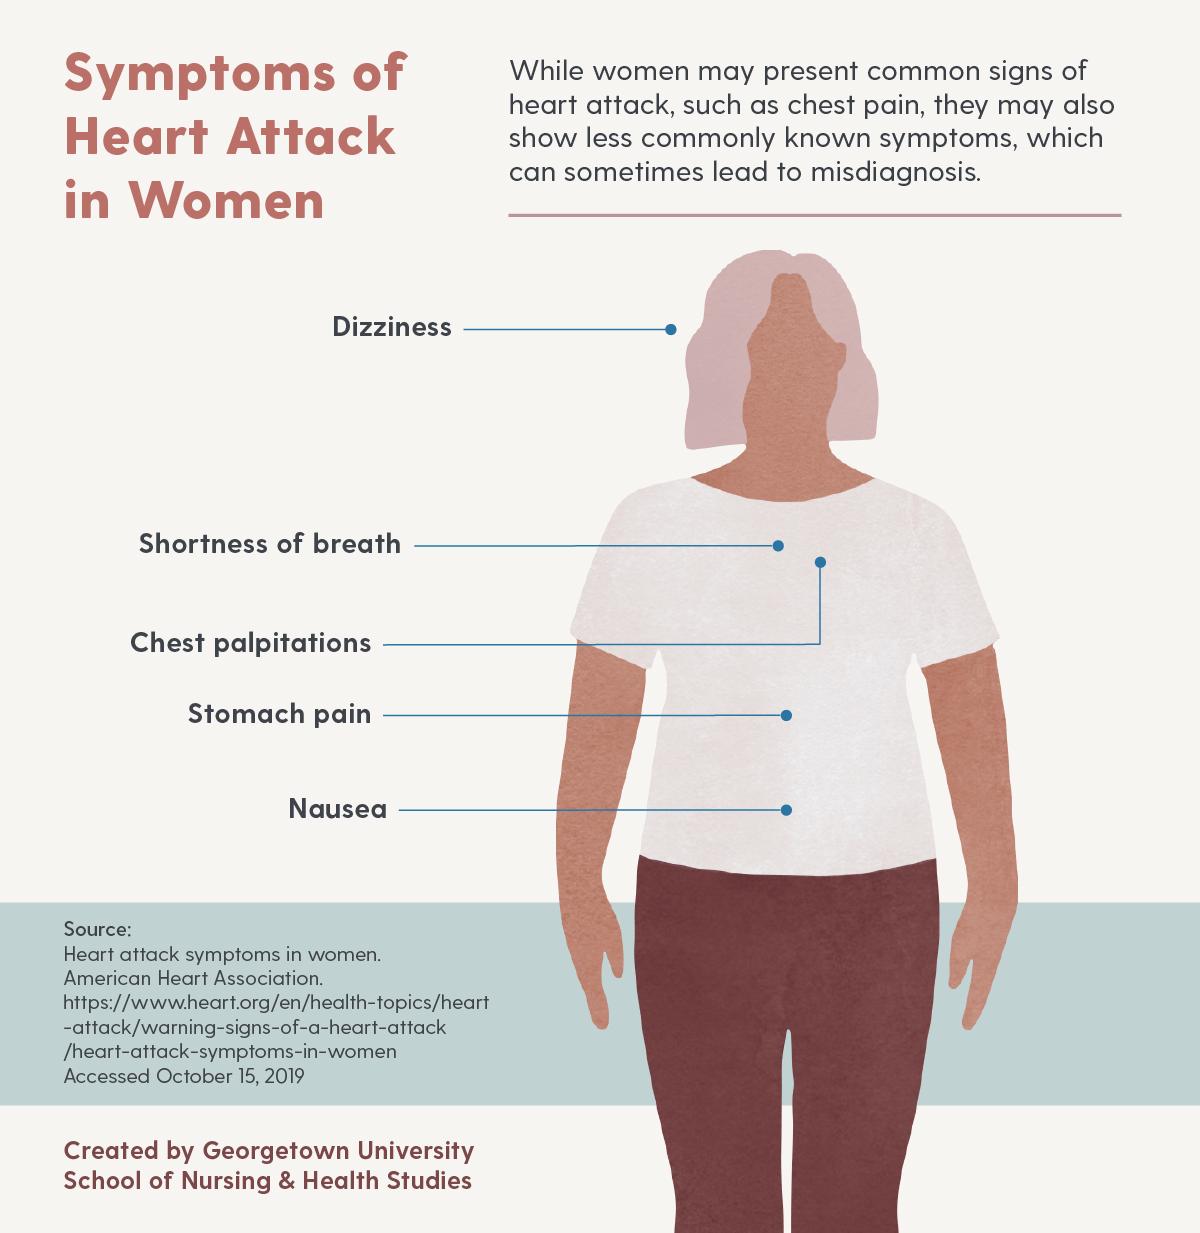 Symptoms of heart attack presented in women